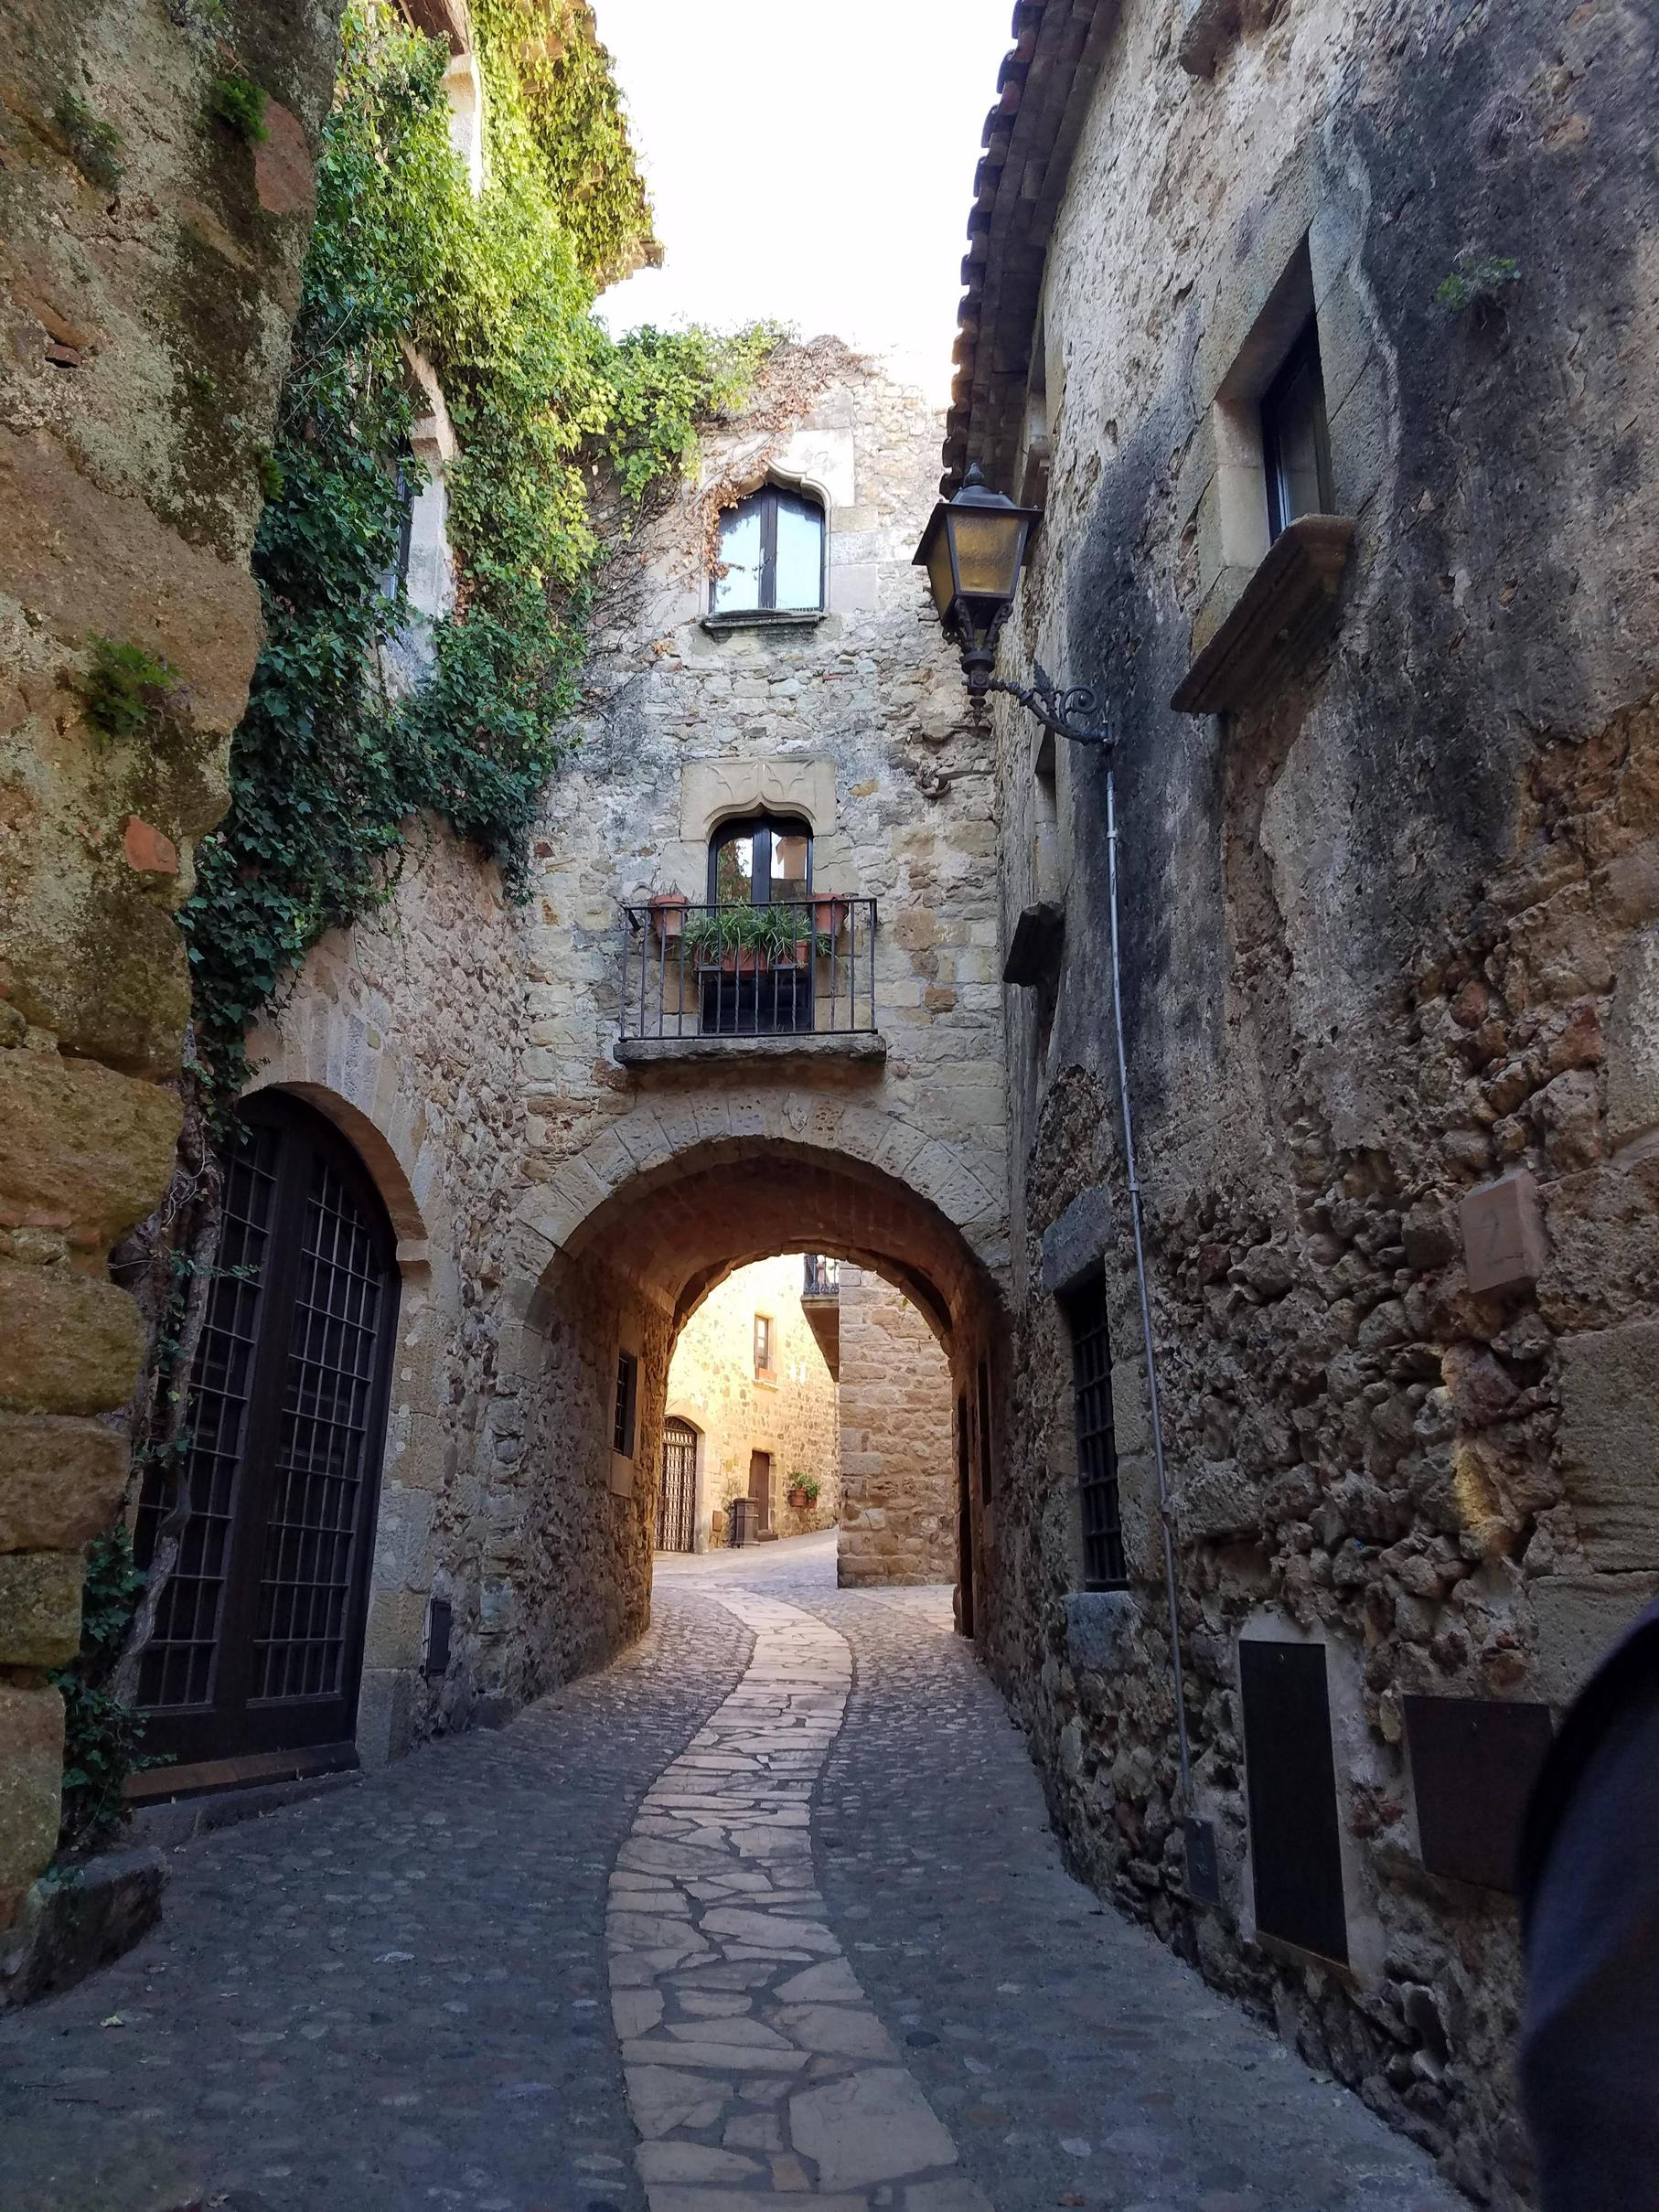 A tiny village outside Girona, Spain